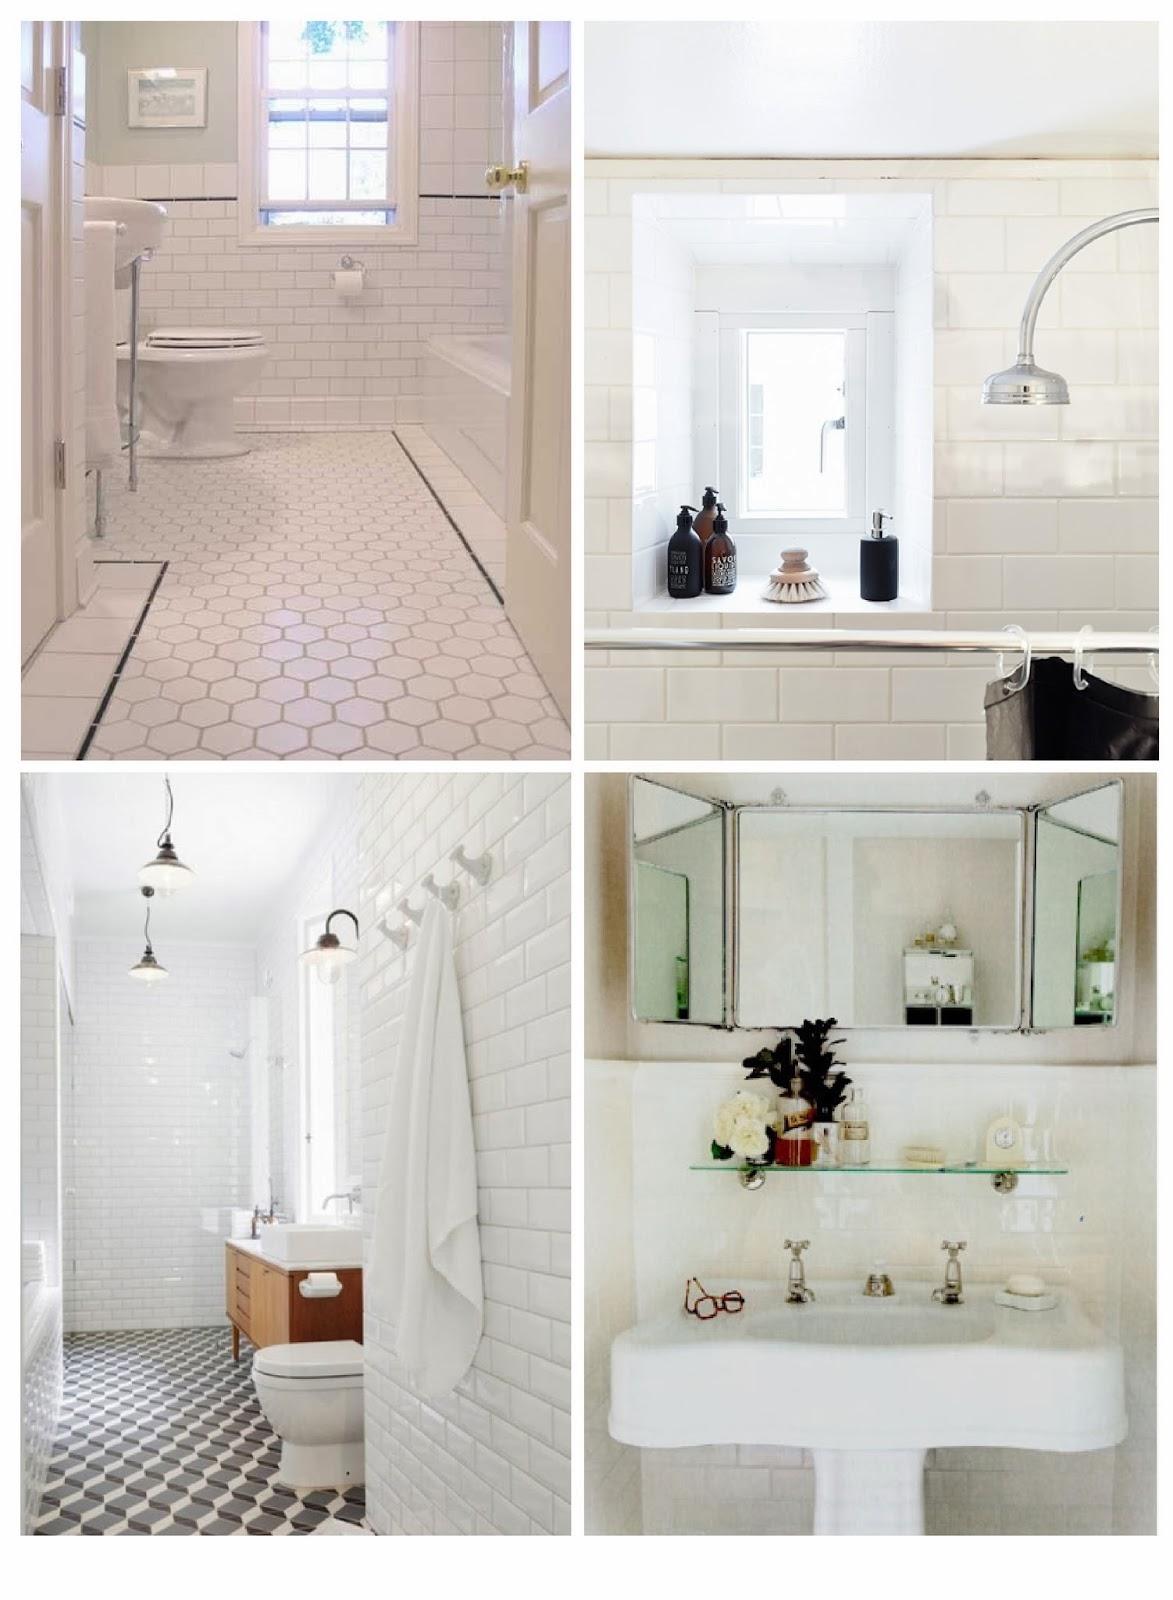 1930s Bathroom Jp Rose Home Detailing An Art Deco Bathroom